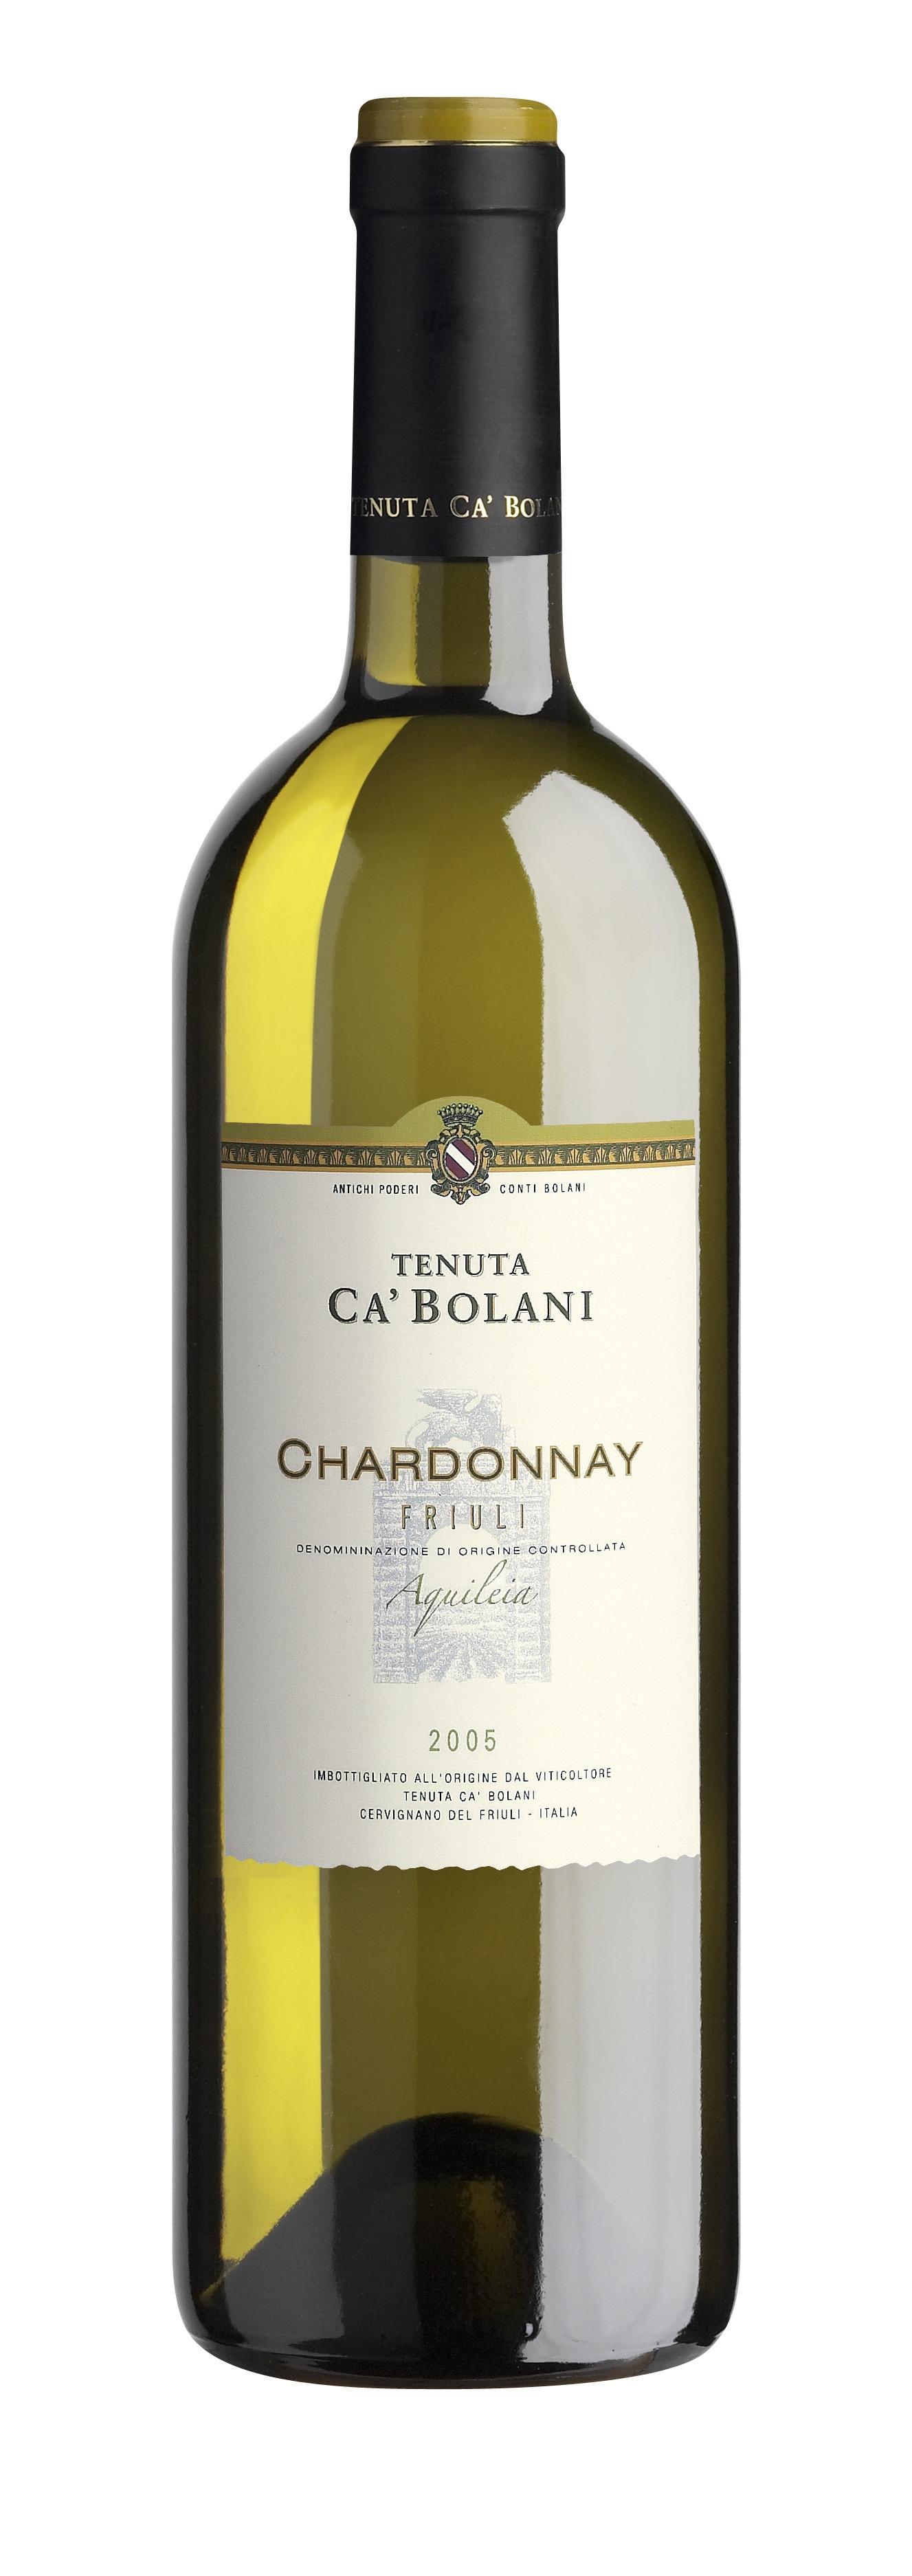 Ca Bolani Chardonnay DOP